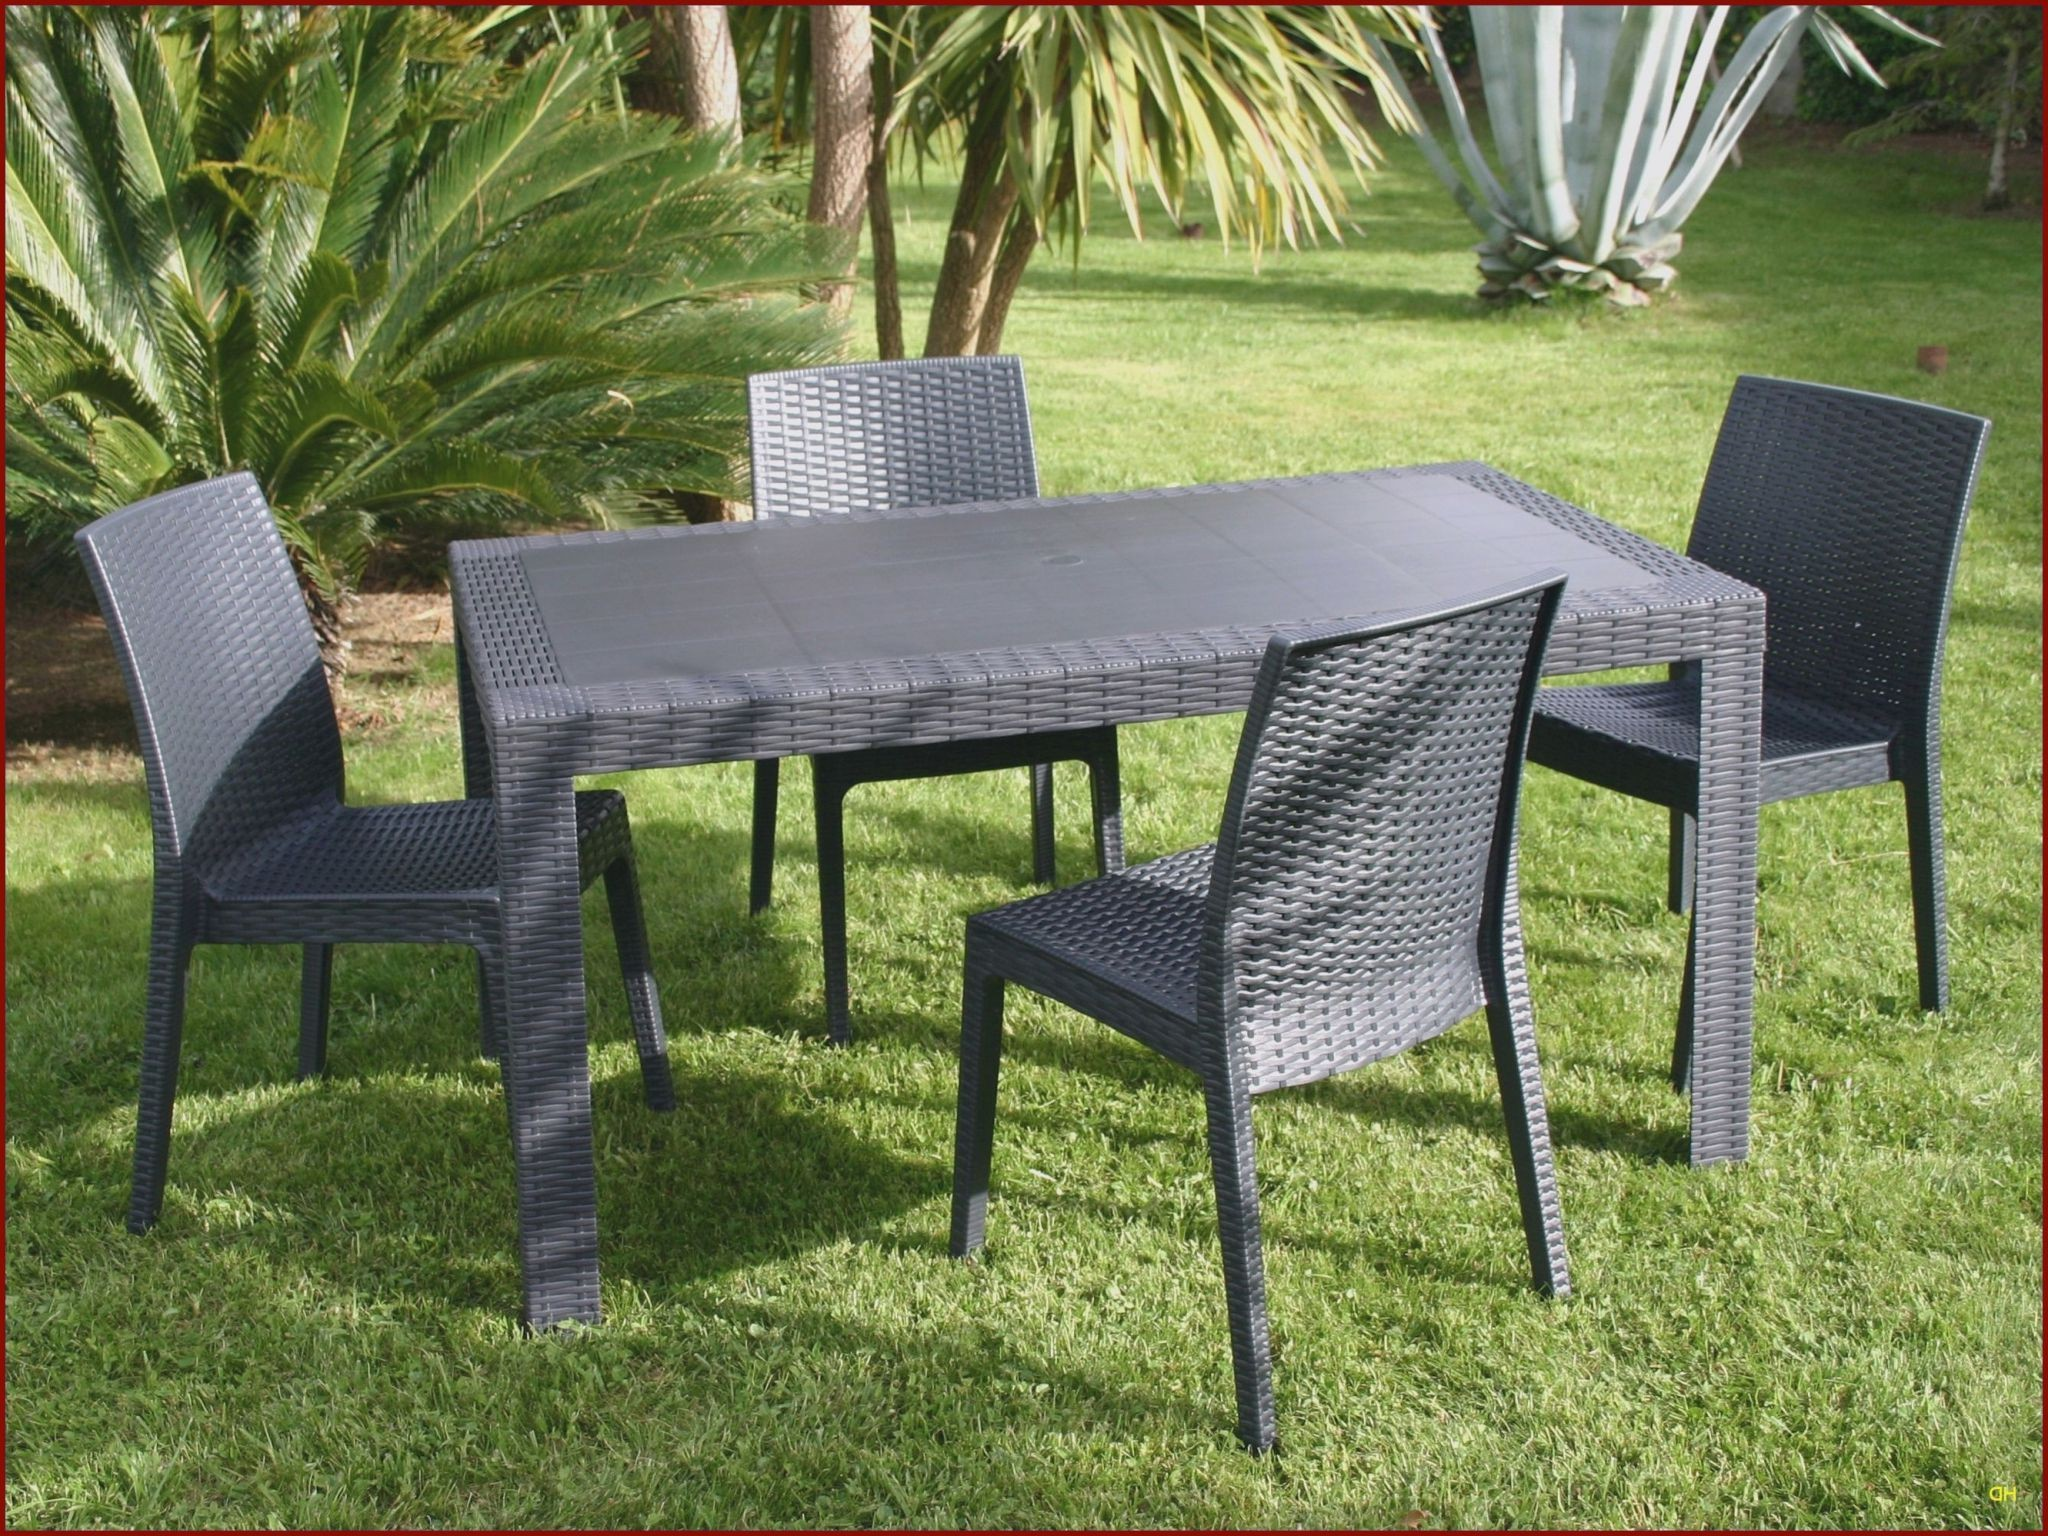 fauteuil de salon de jardin new chaises luxe chaise ice 0d table jardin resine lovely of fauteuil de salon de jardin